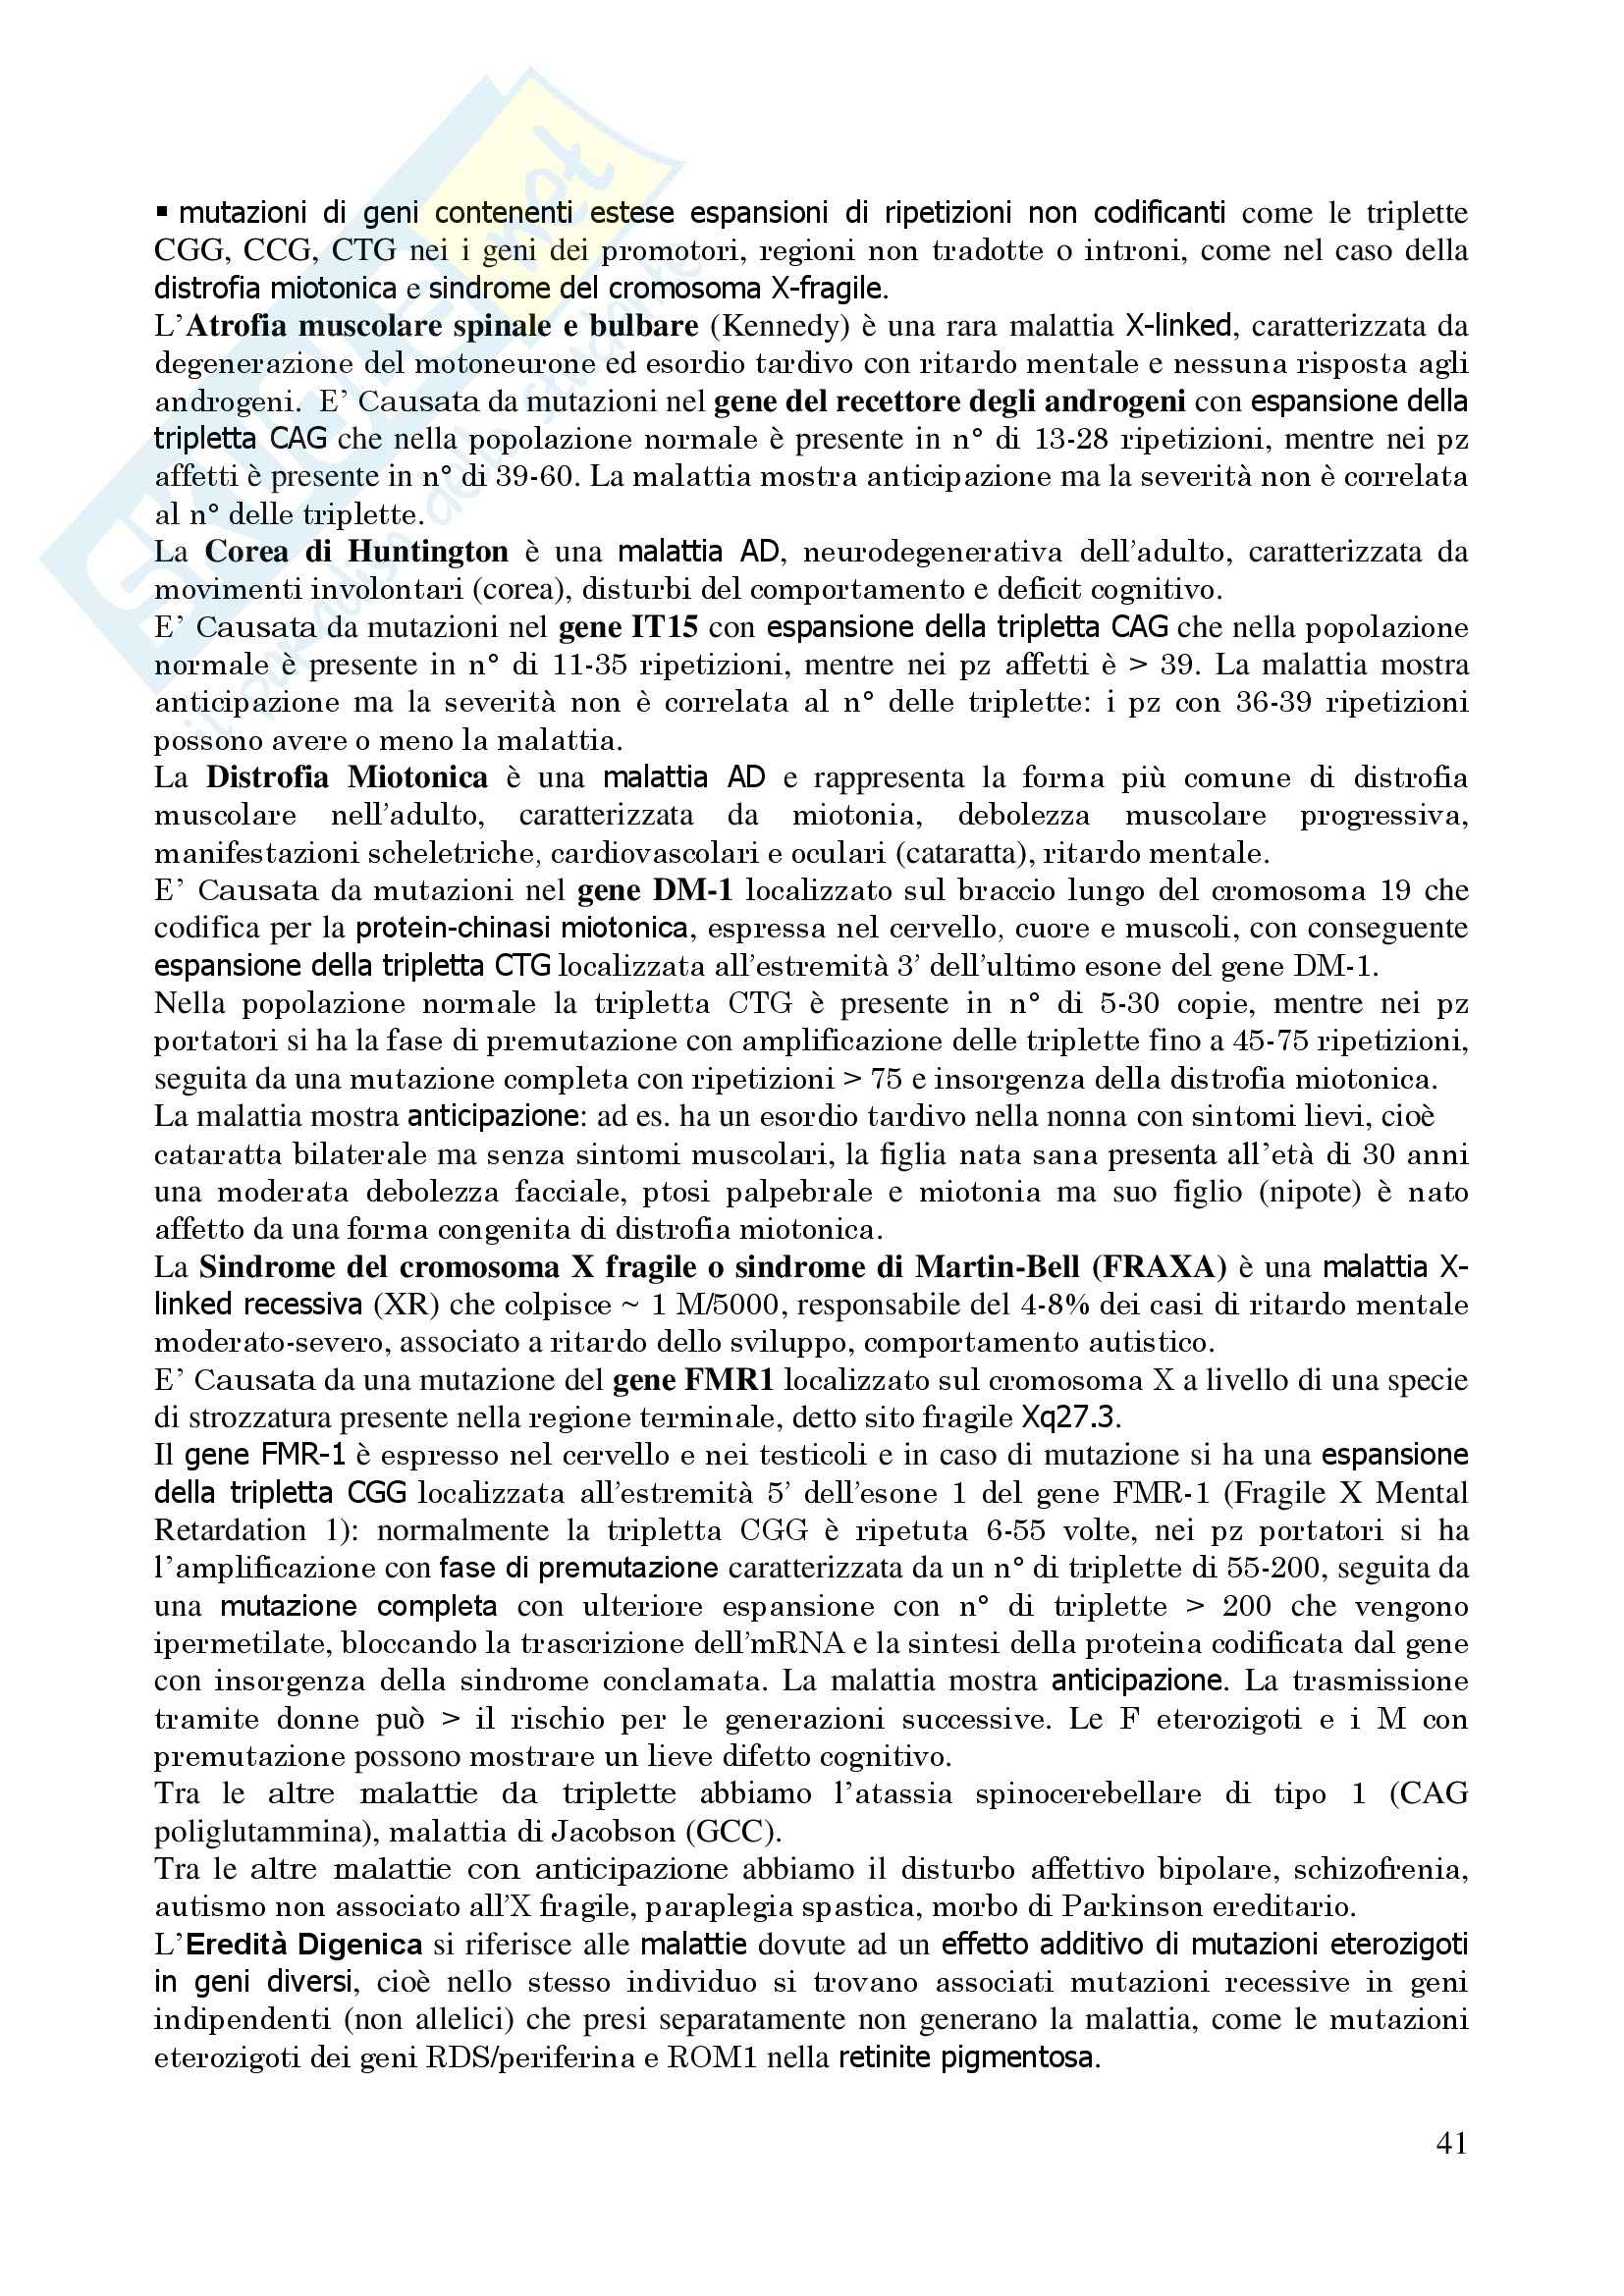 Genetica Umana - Appunti Pag. 41